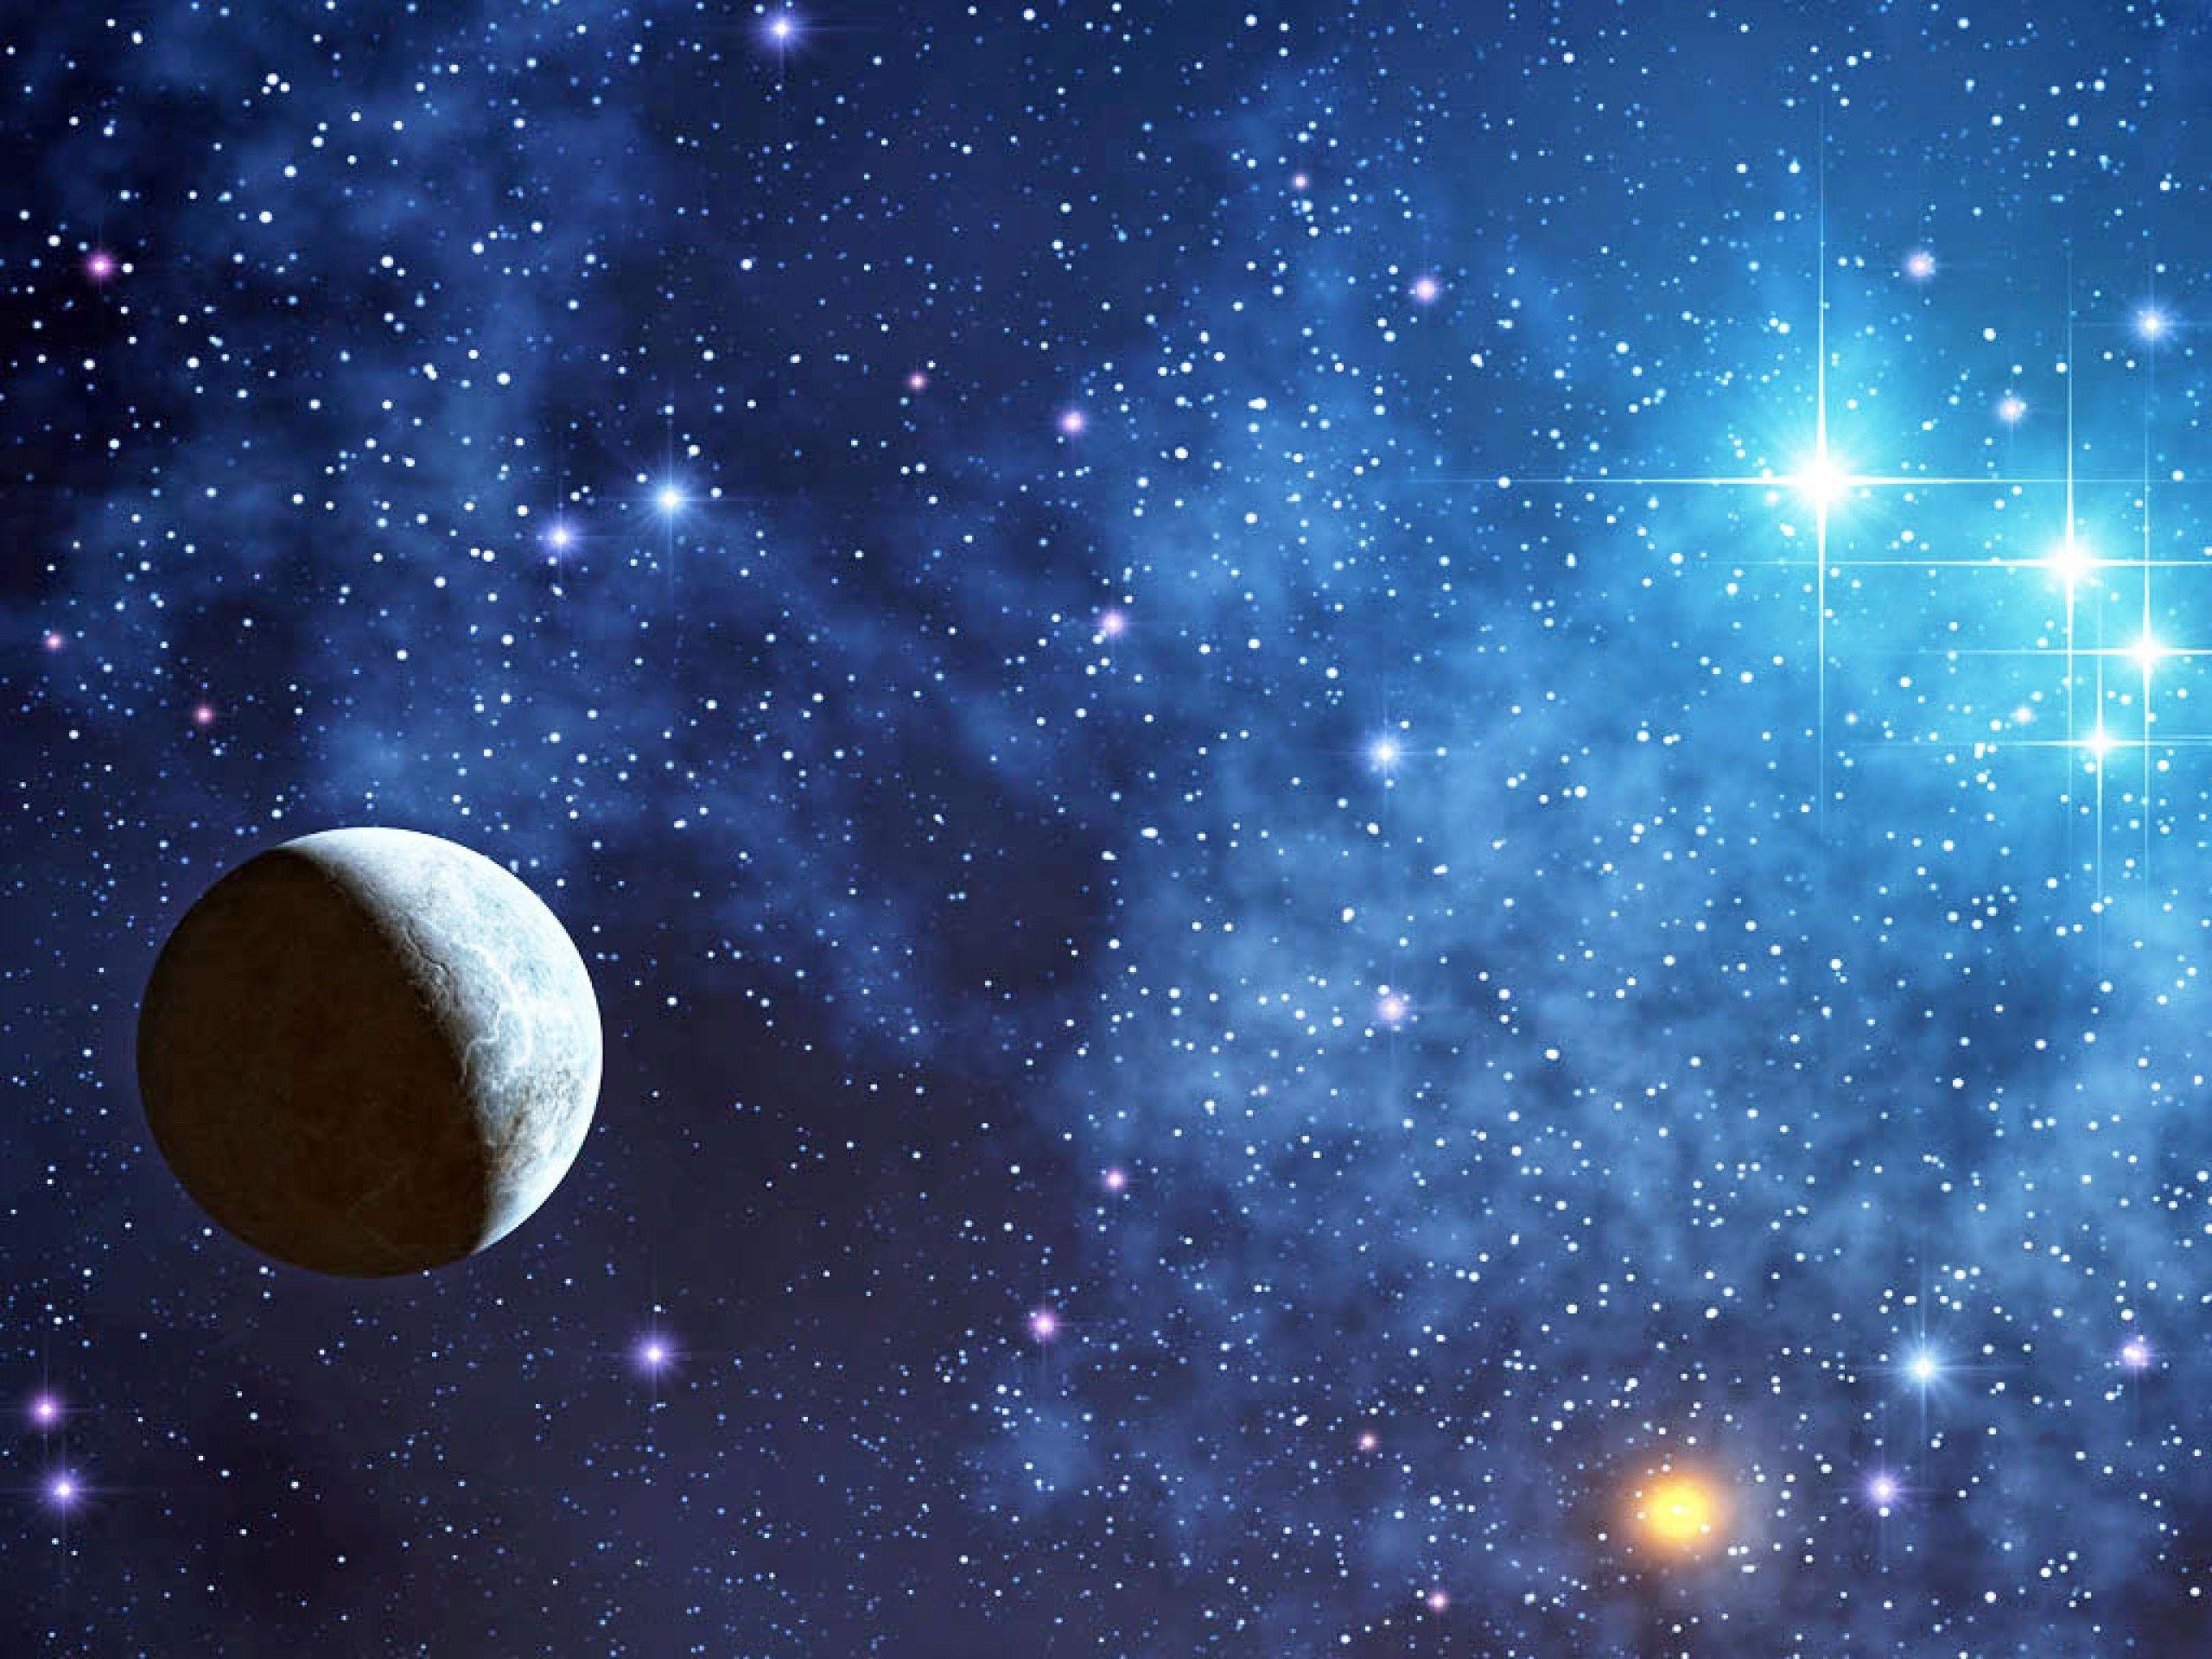 2560x1920 Wallpaper: Moon Surrounding With Stars Wallpaper